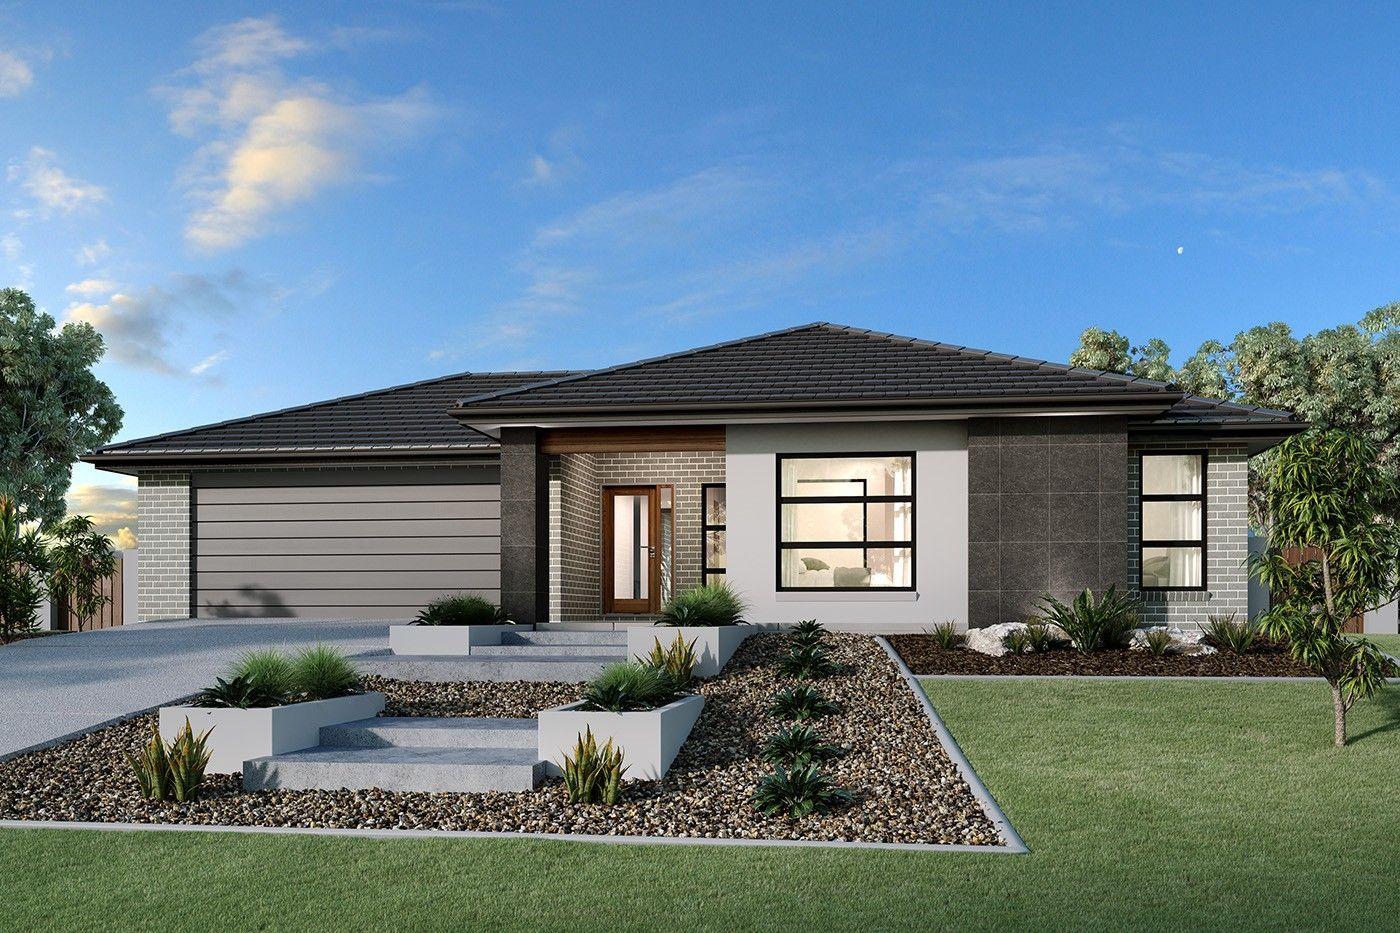 Lot 20 Thirteenth Avenue, Austral NSW 2179, Image 0